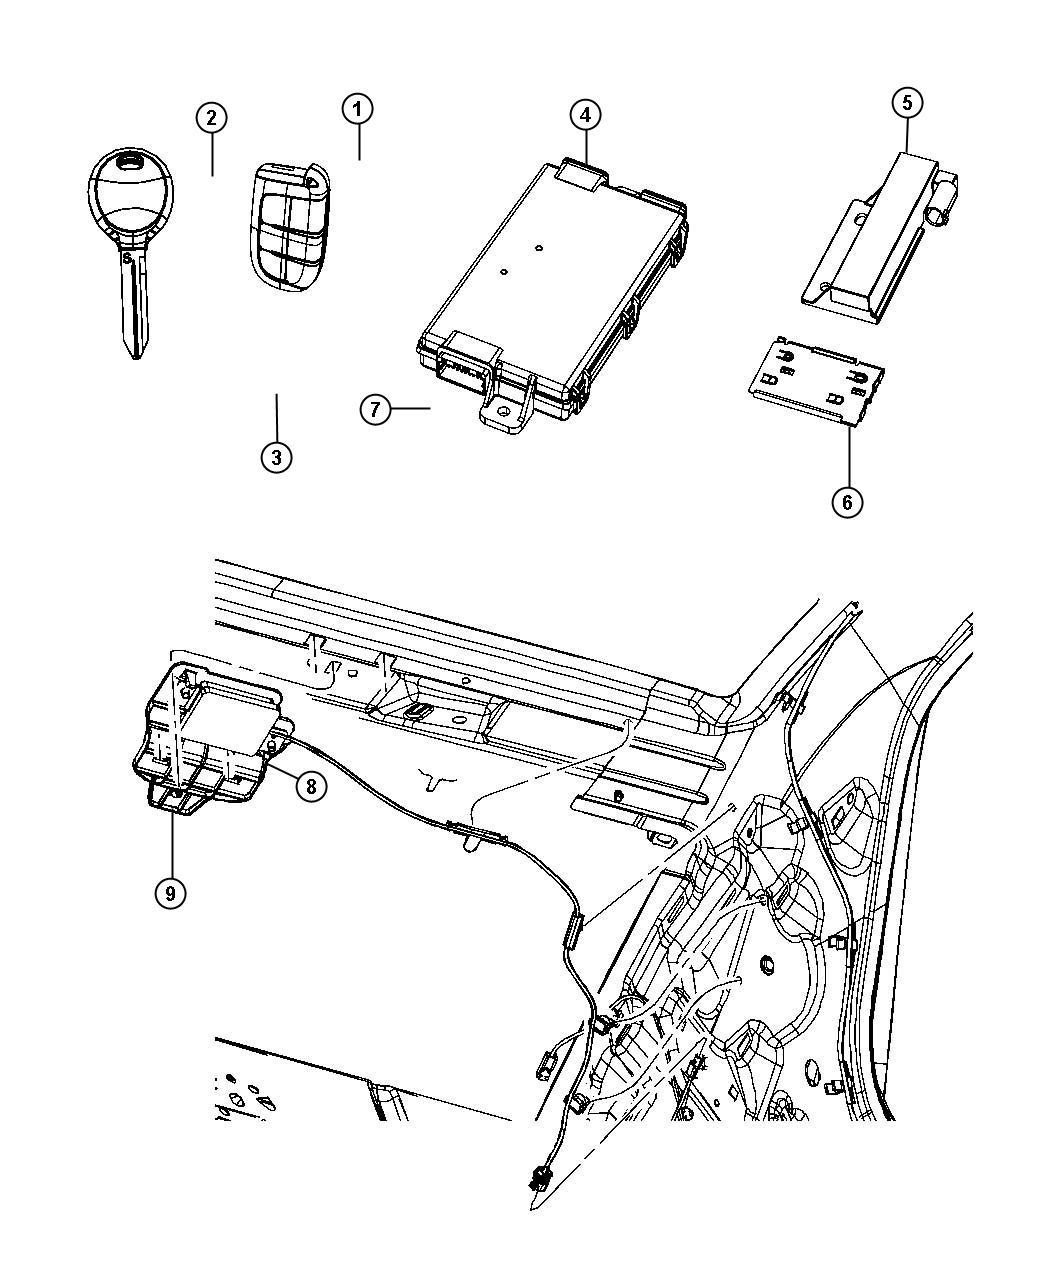 Chrysler 300 Receiver Hub Remote Start System